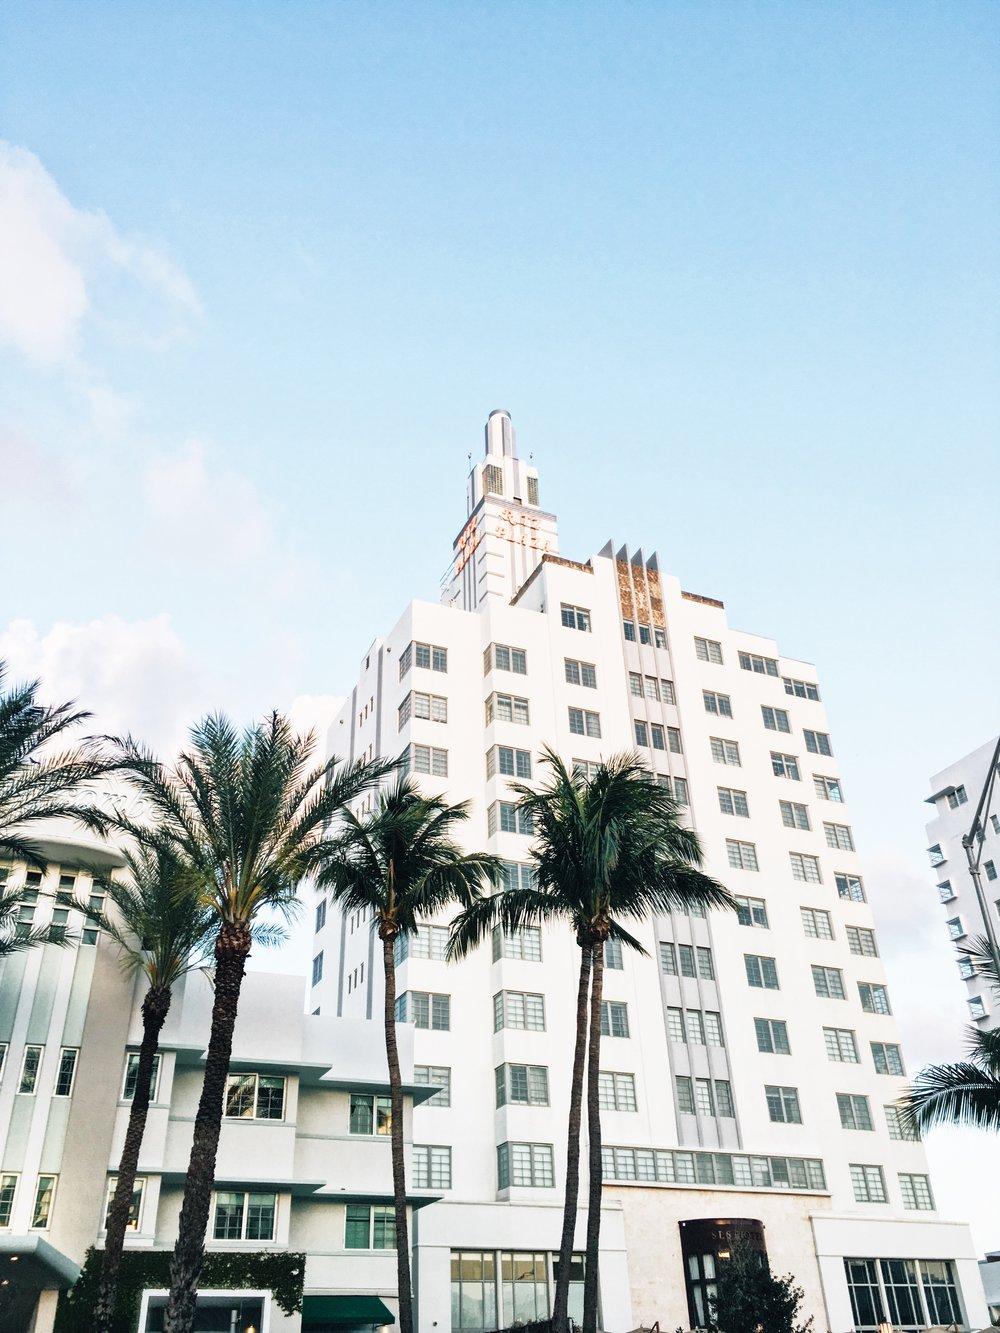 Miami Art Deco District design inspiration